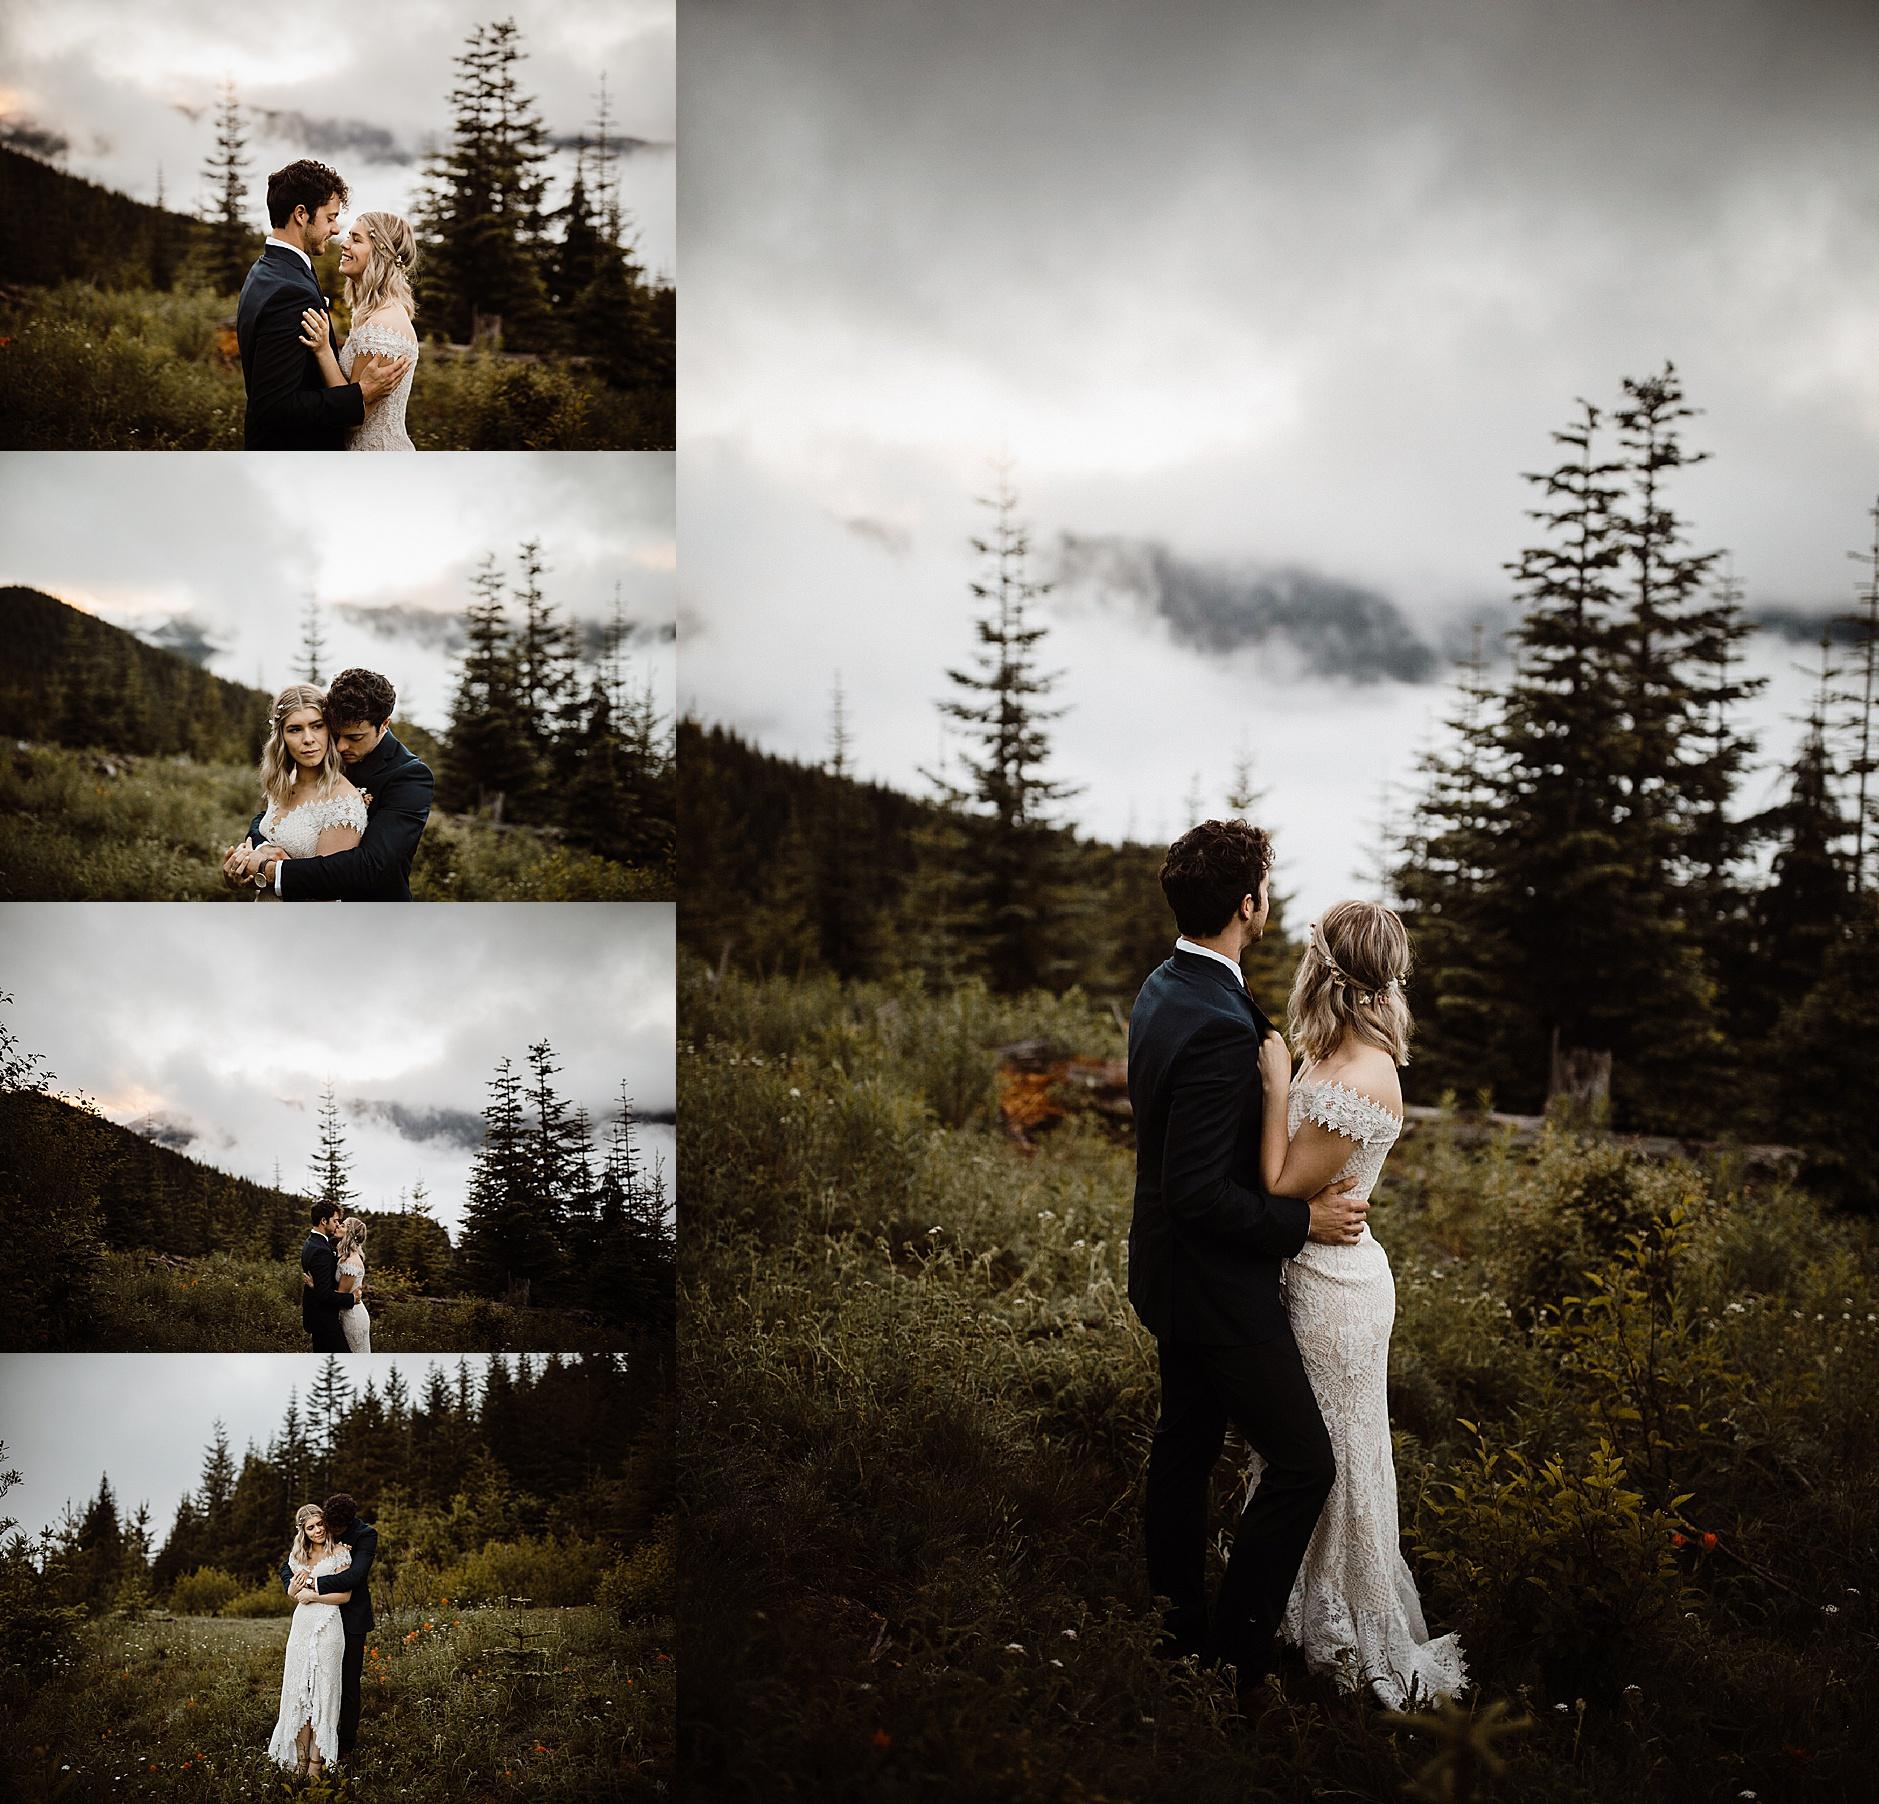 Summer Seattle Mt. Rainier Elopement Ideas (129 of 139).jpg